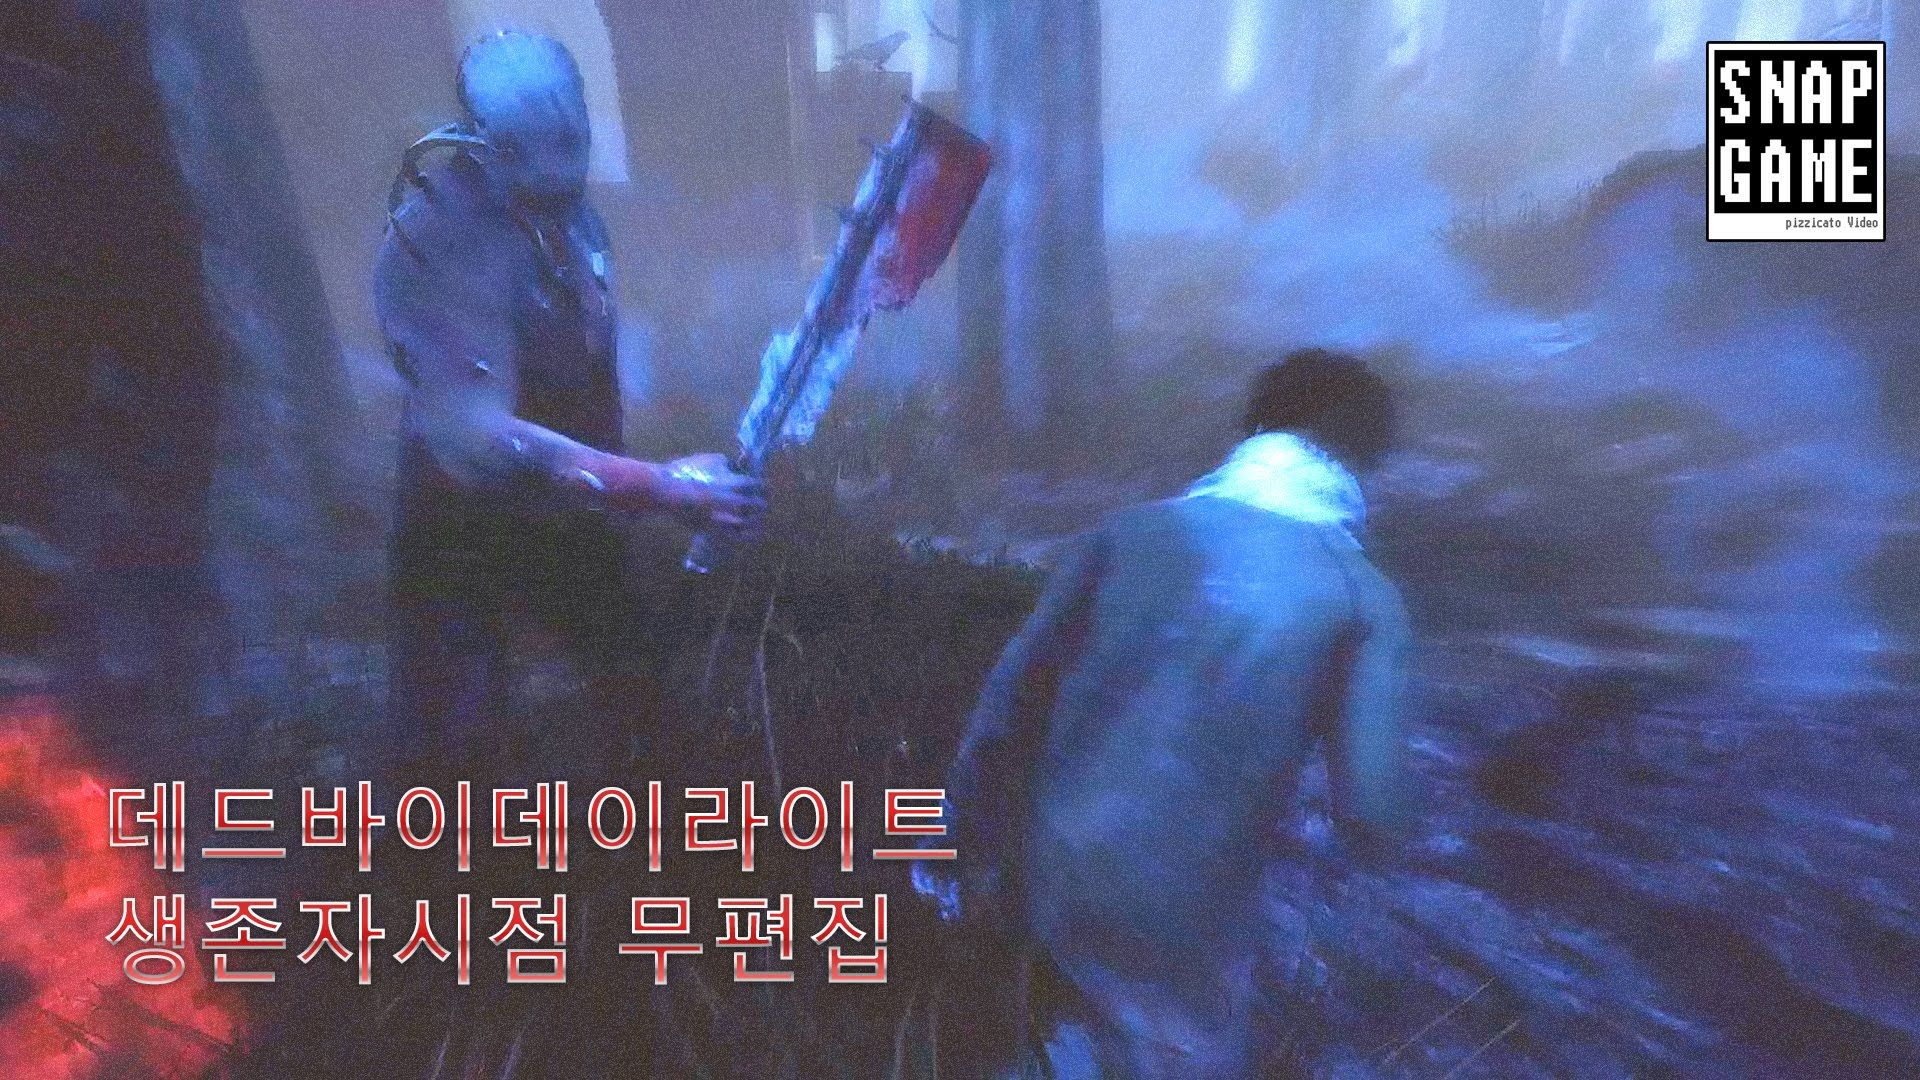 [SnapGame#04] Dead by Daylight Survivor/ 데드바이데이라이트 생존자 무편집 - YouTube